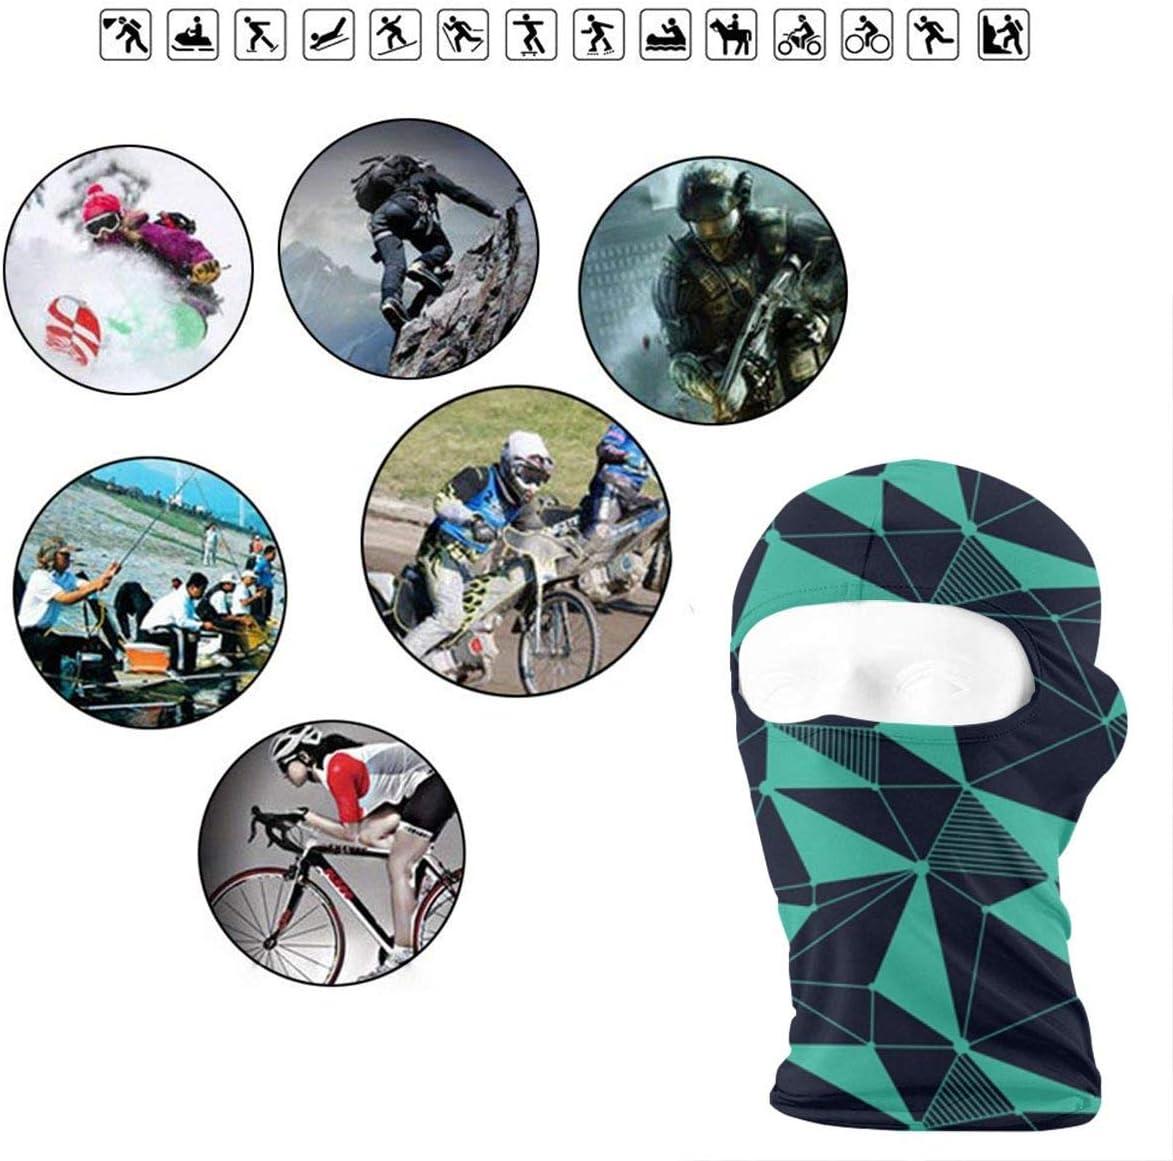 CAClifestyle Green Geometric Line Pattern Unisex Windproof Balaclavas Full Face Mask Hood